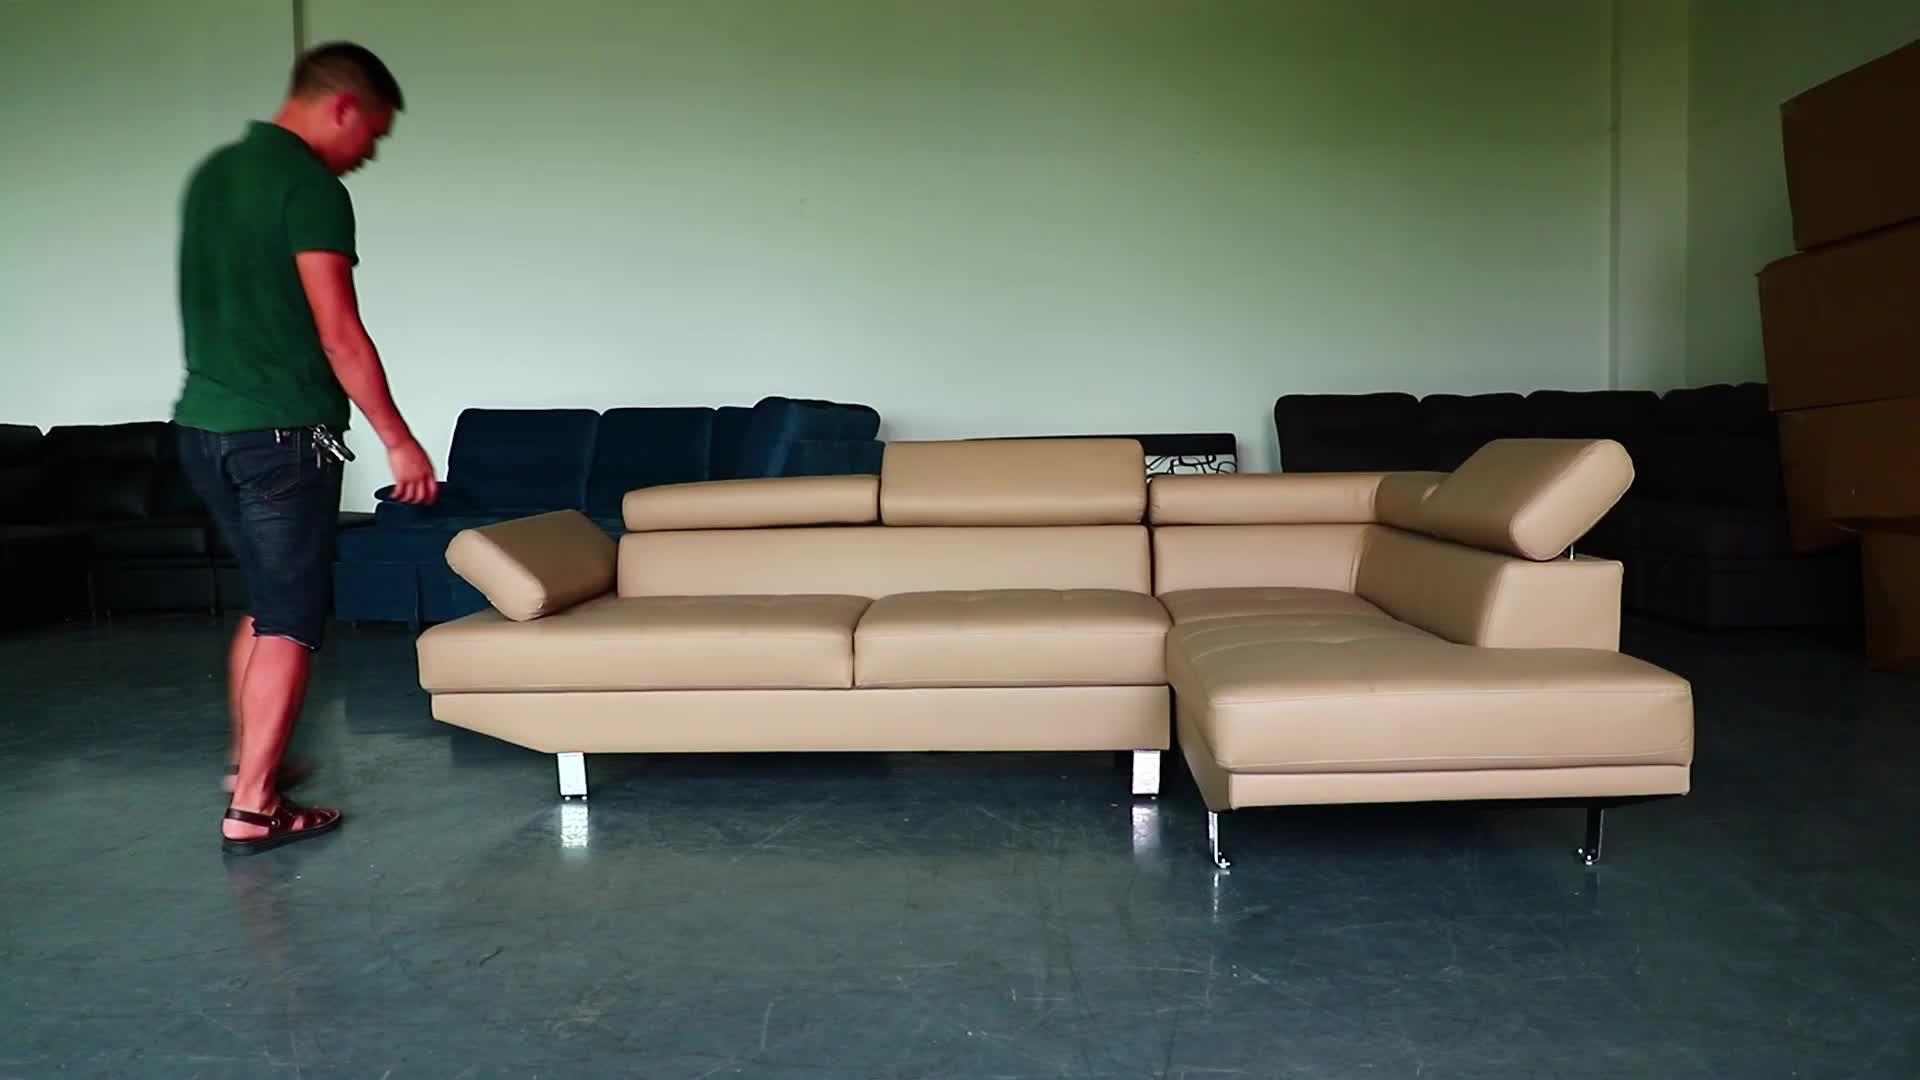 आधुनिक डिजाइन कोने सोफे एल आकार अनुभागीय